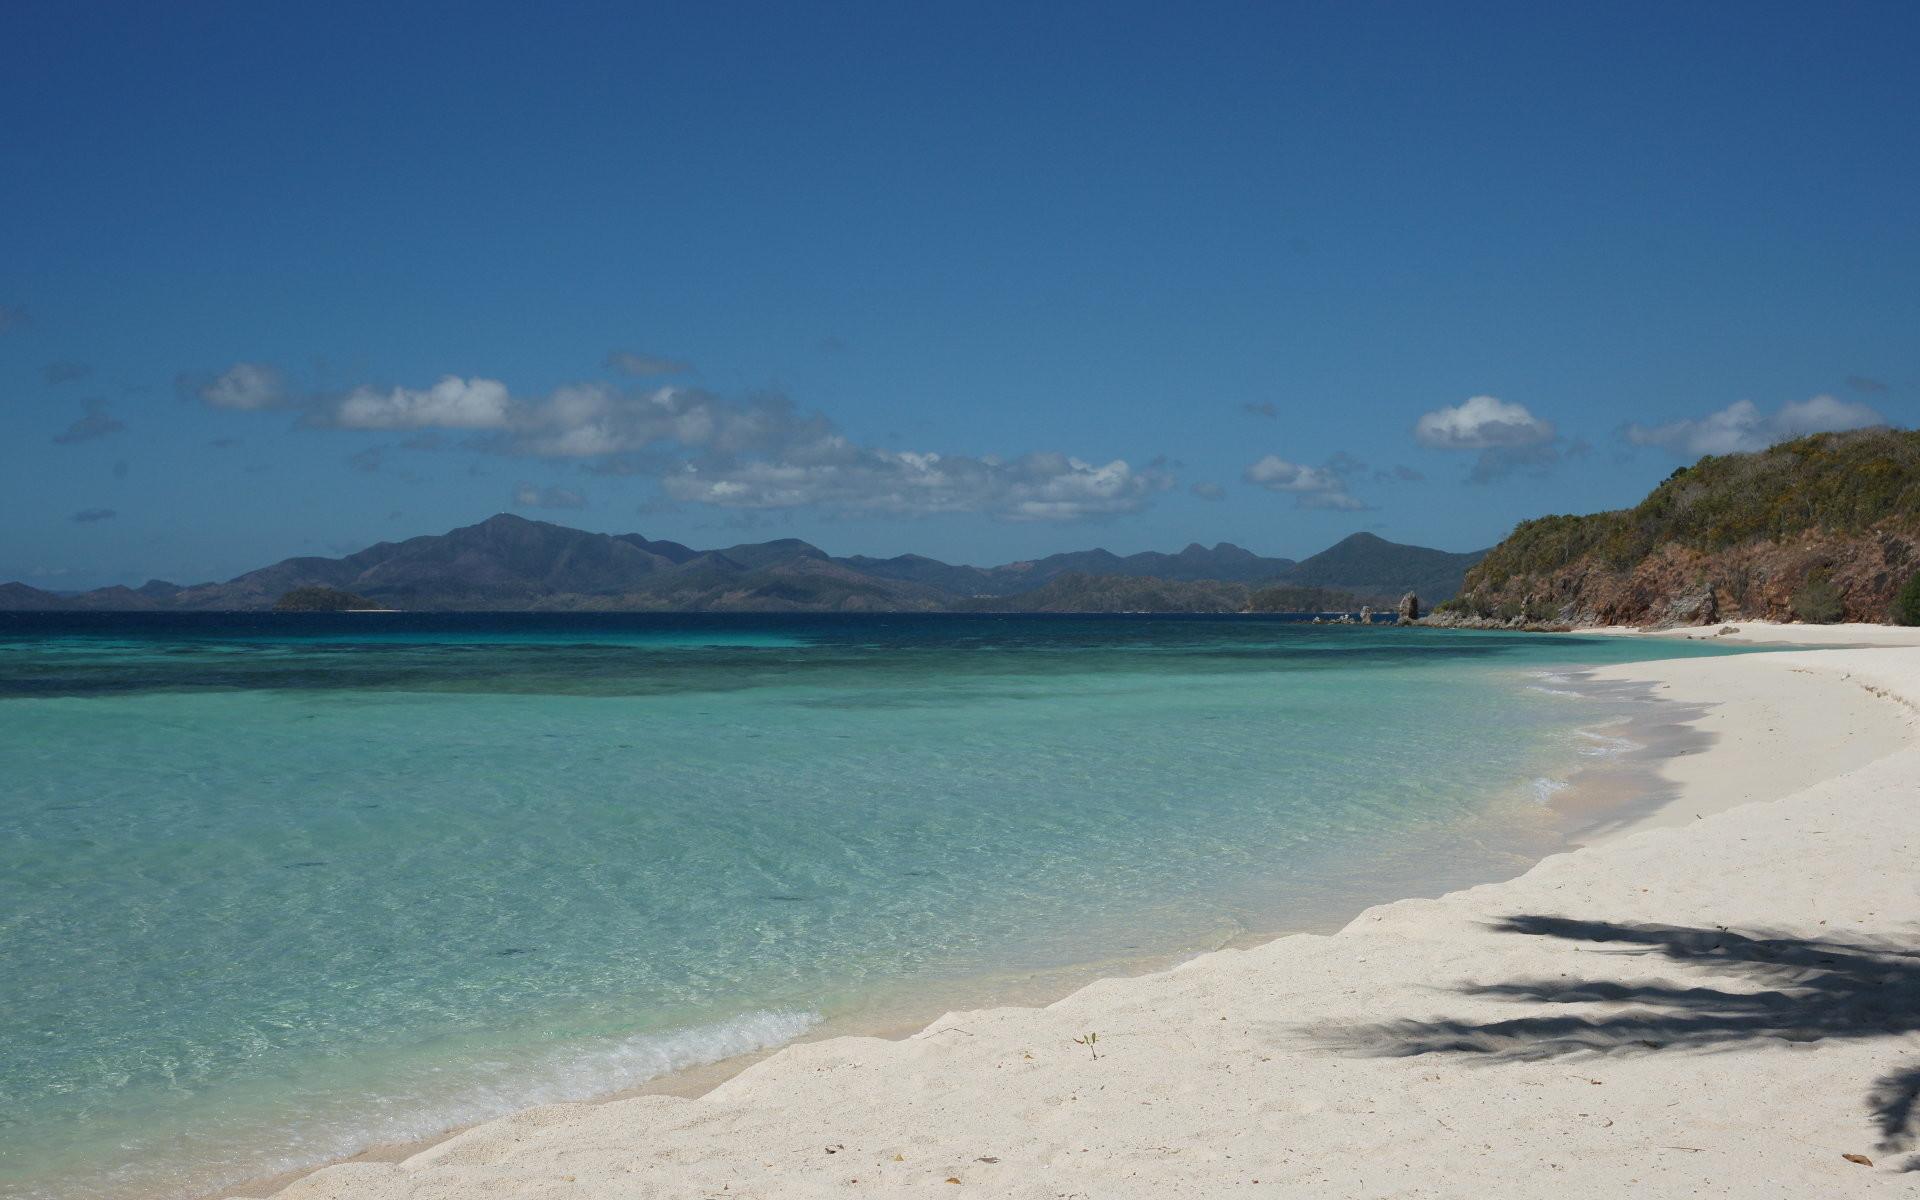 high resolution wallpaper 1920x1200px. Malcapuya island most beautiful beach